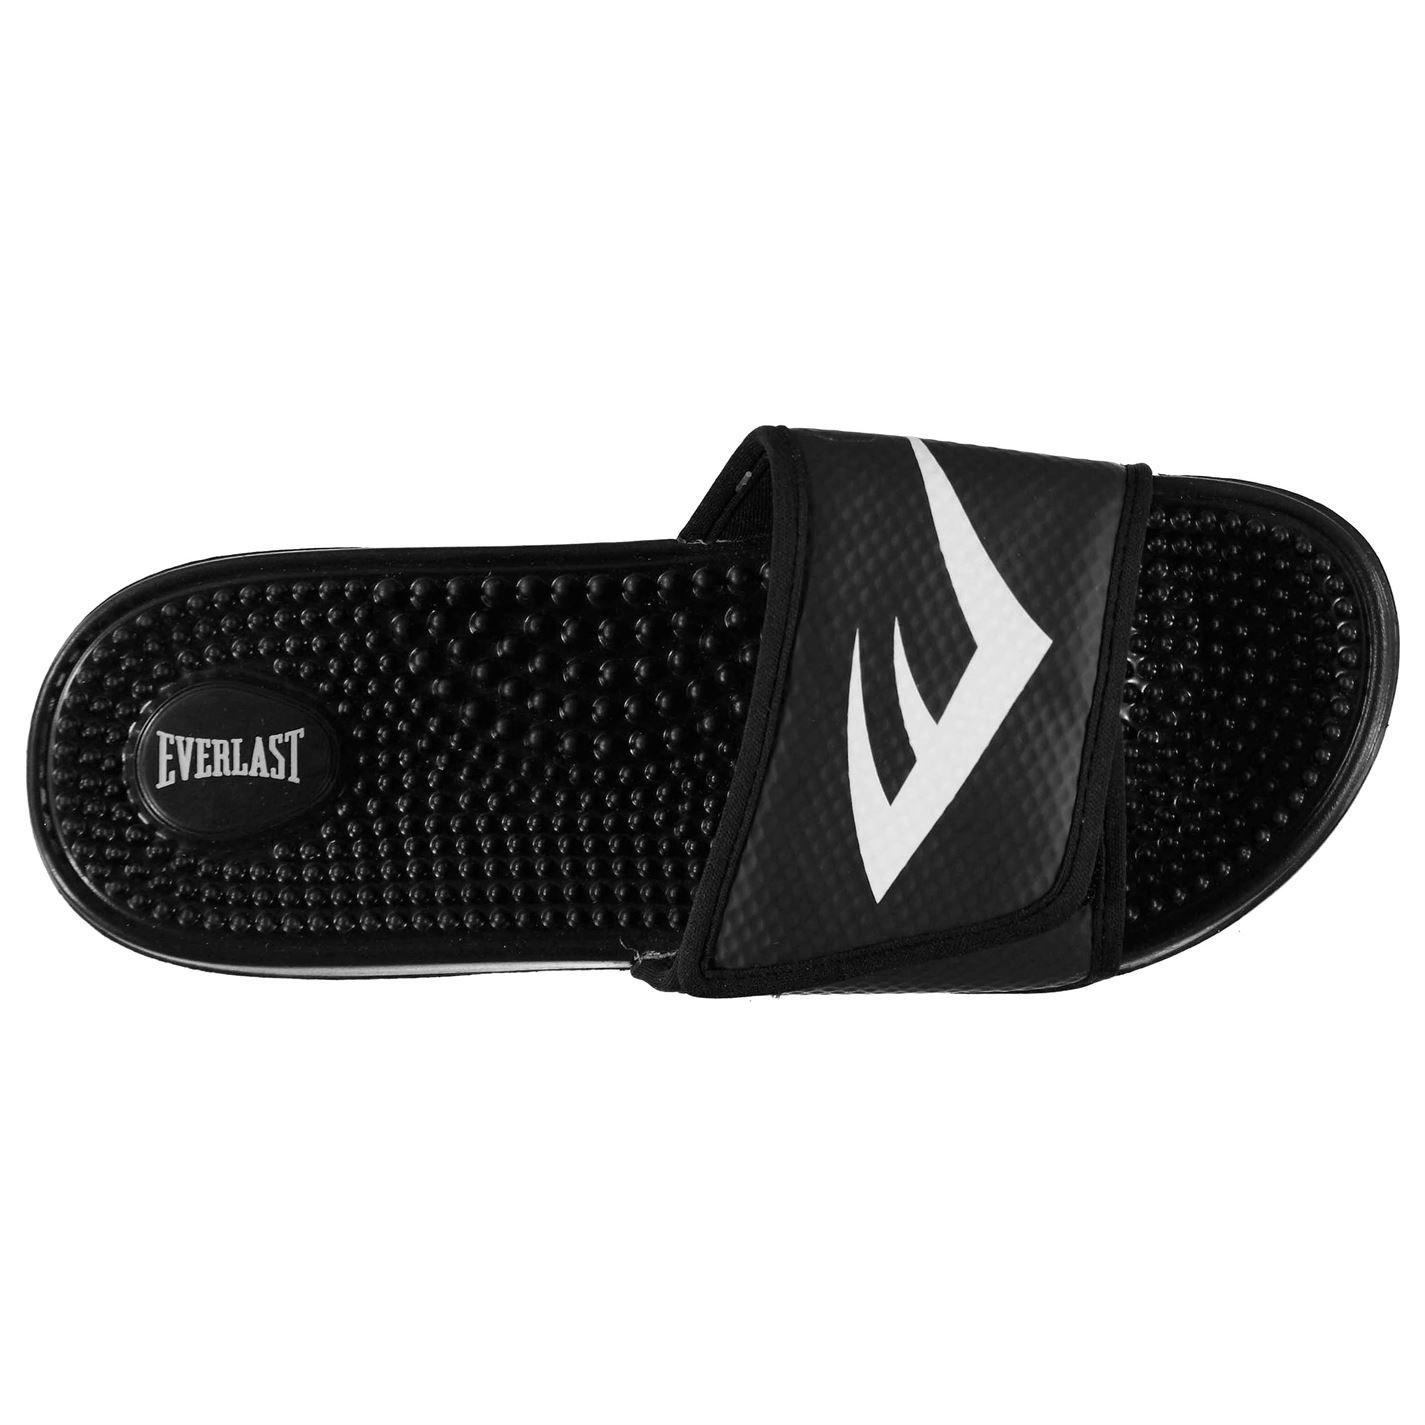 4865209447890d Everlast Mens Massage Sliders Black White UK 10 (44)  Amazon.co.uk  Shoes    Bags